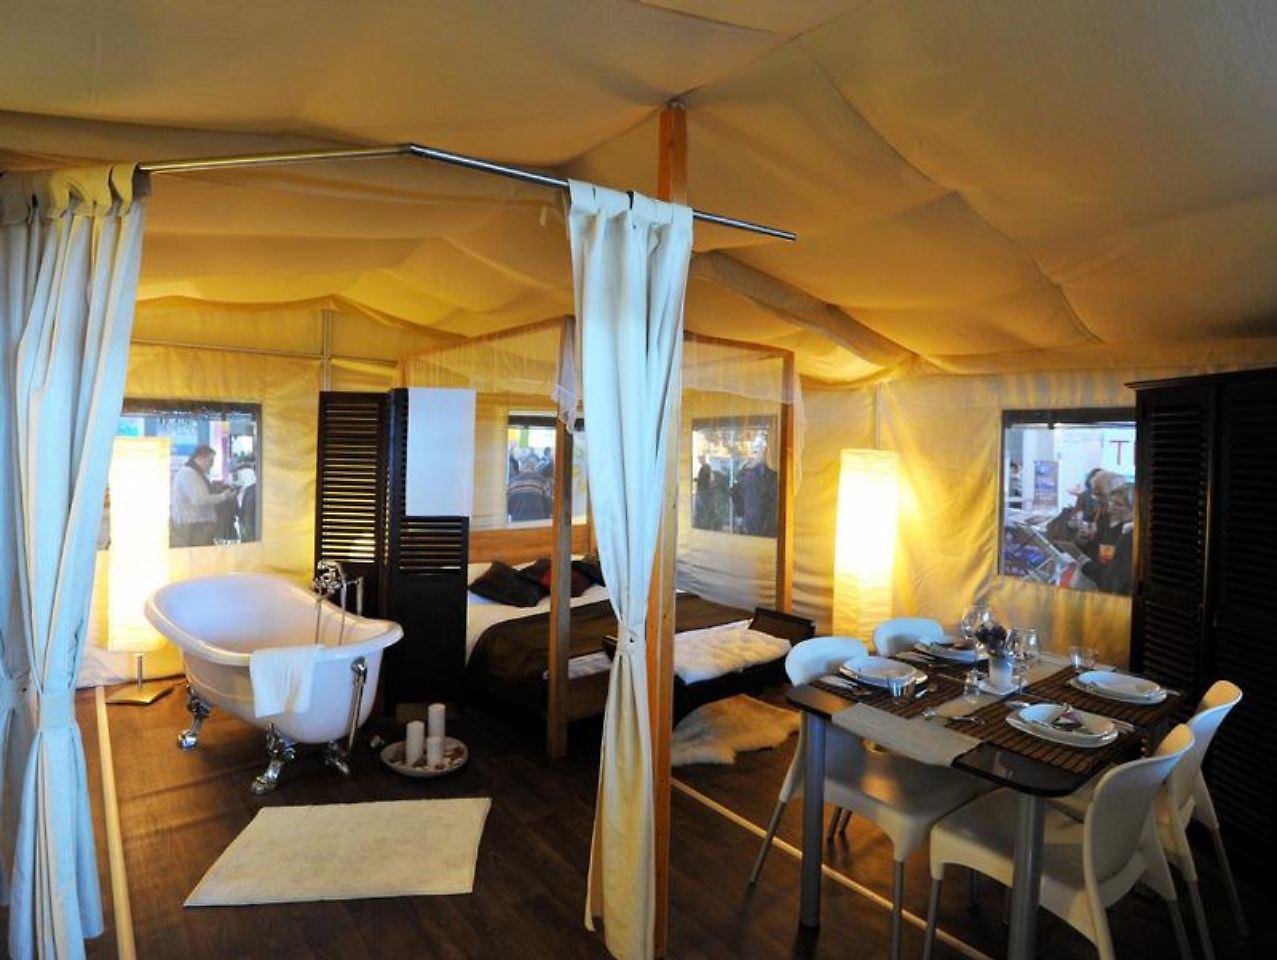 glamping statt camping urlauber wollen mehr luxus n. Black Bedroom Furniture Sets. Home Design Ideas